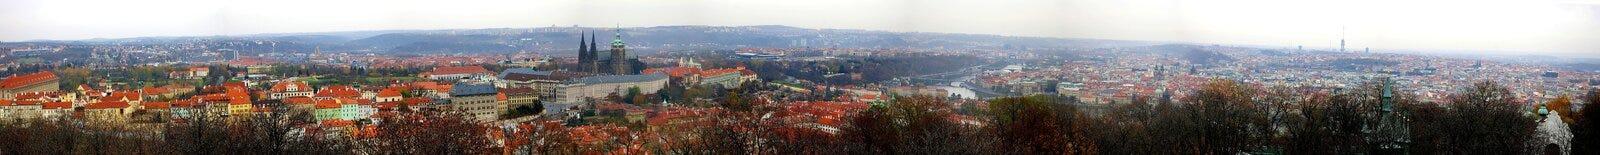 Praga - panorama de Petrin fotos de archivo libres de regalías